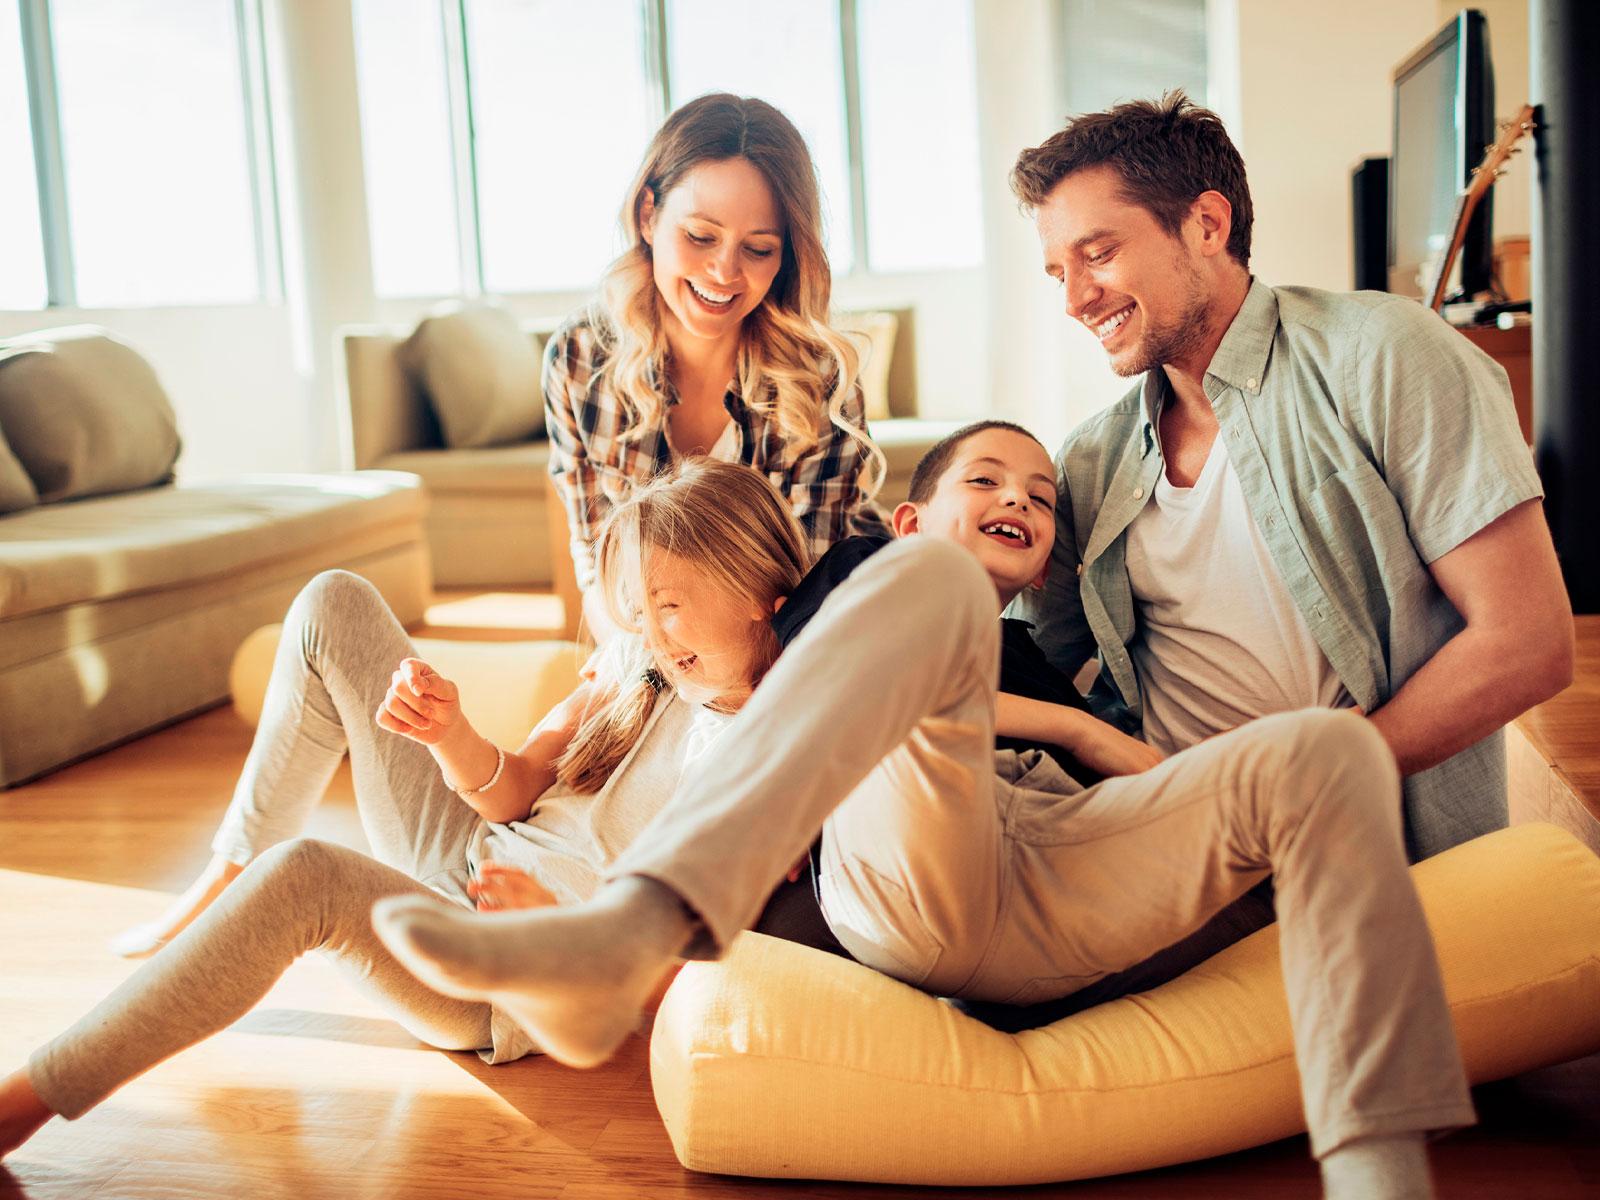 Familia, projeto de Deus para a felicidade